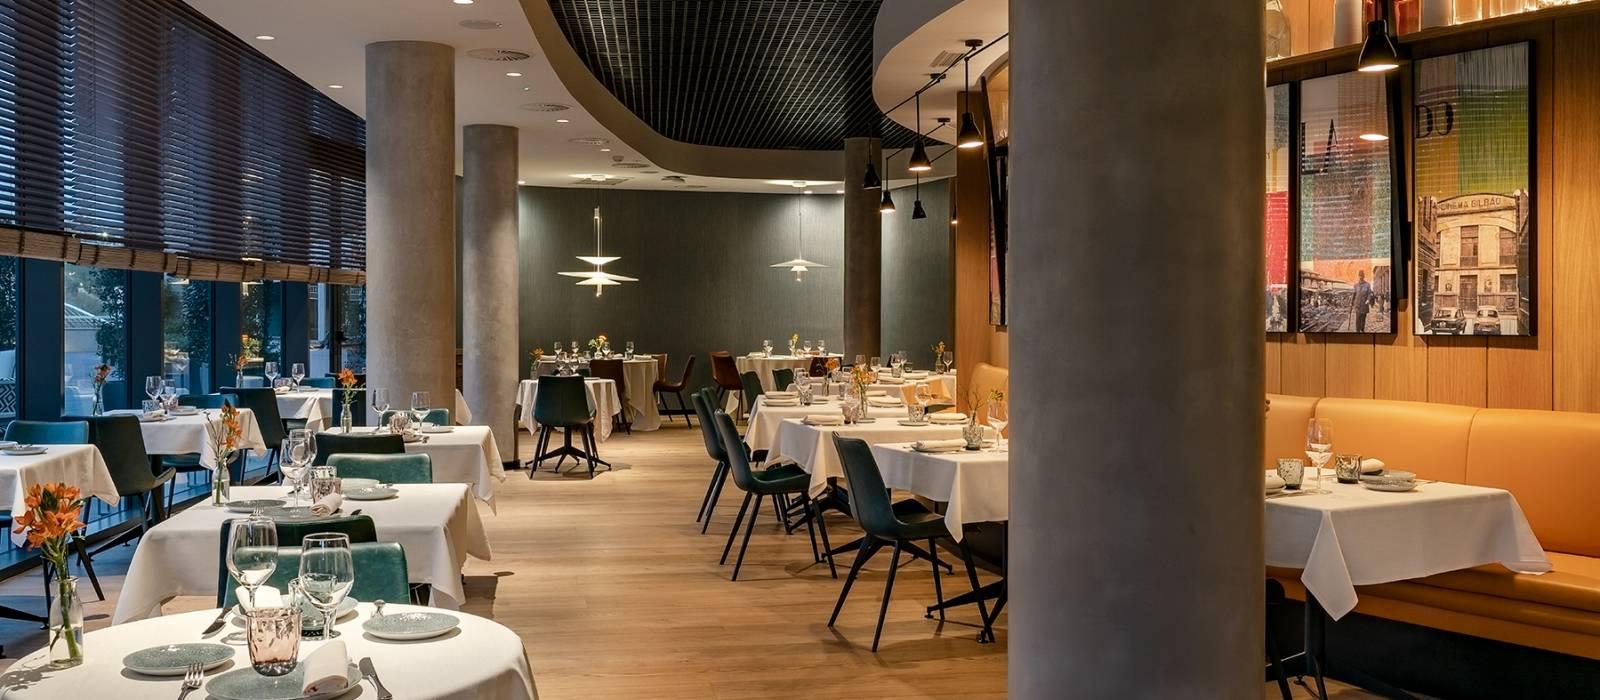 Vincci Consulado de Bilbao - Restaurante Kondutxo